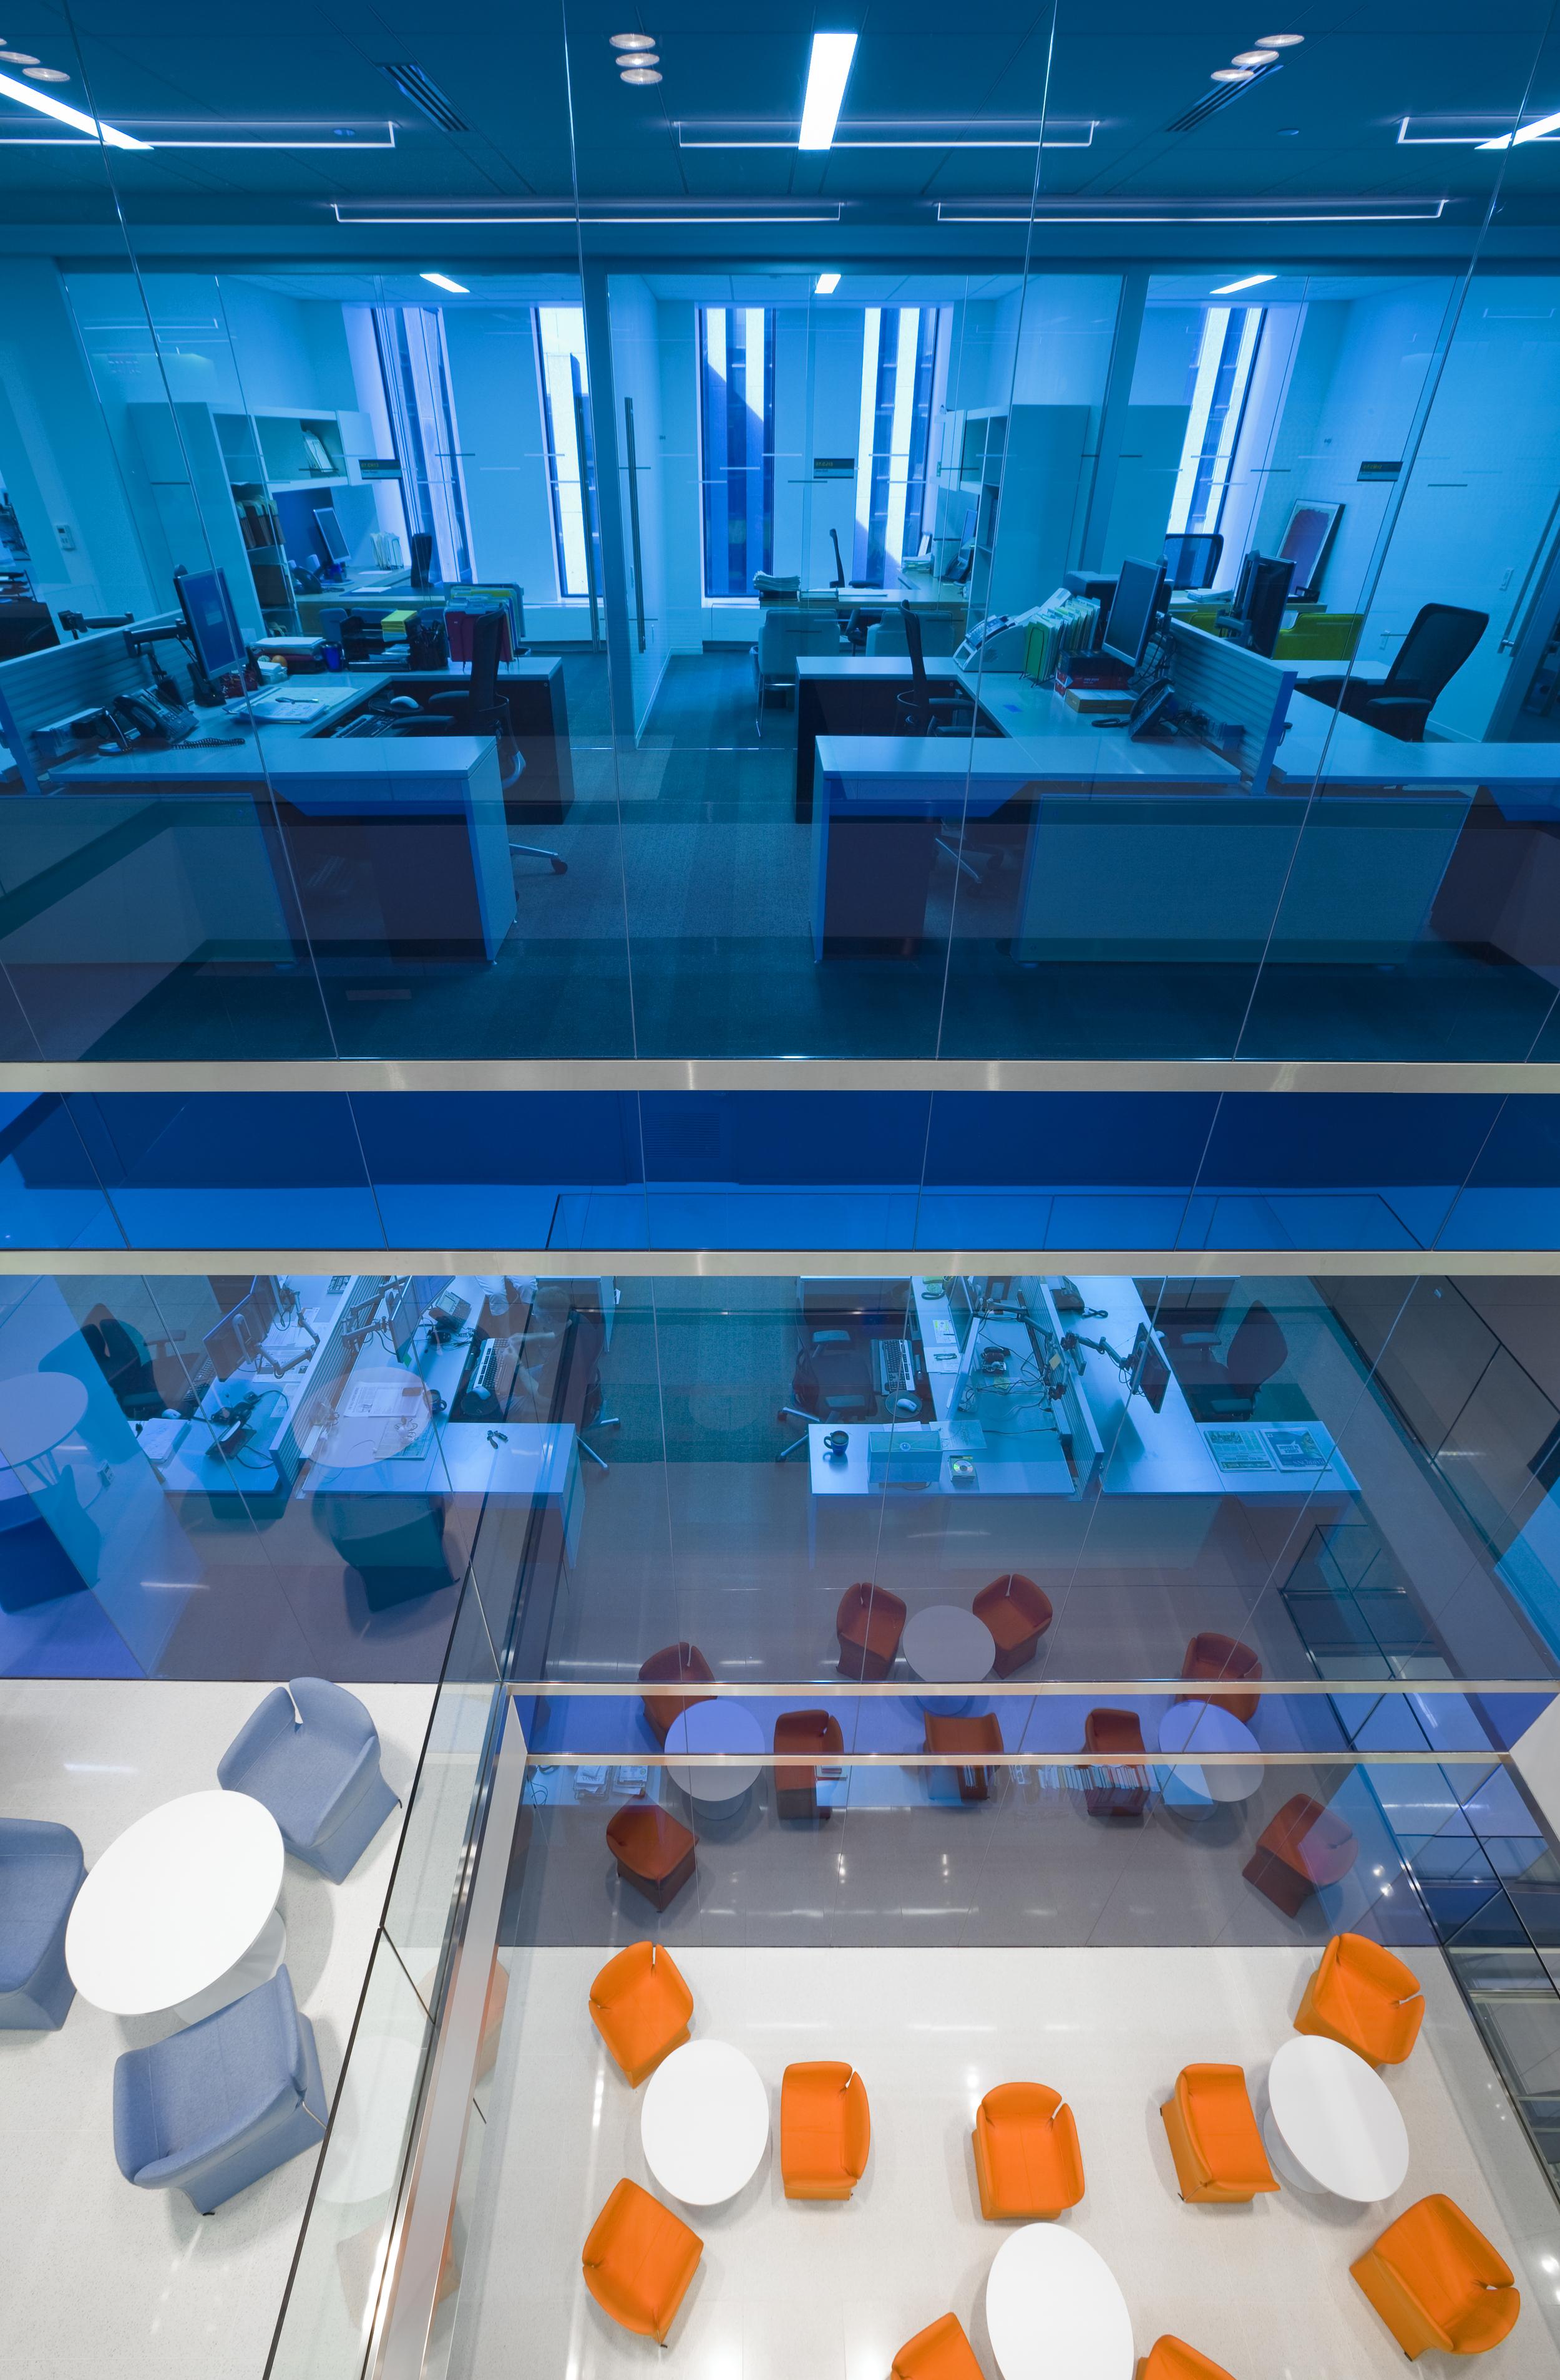 DJ_blue glass and workspace.jpg